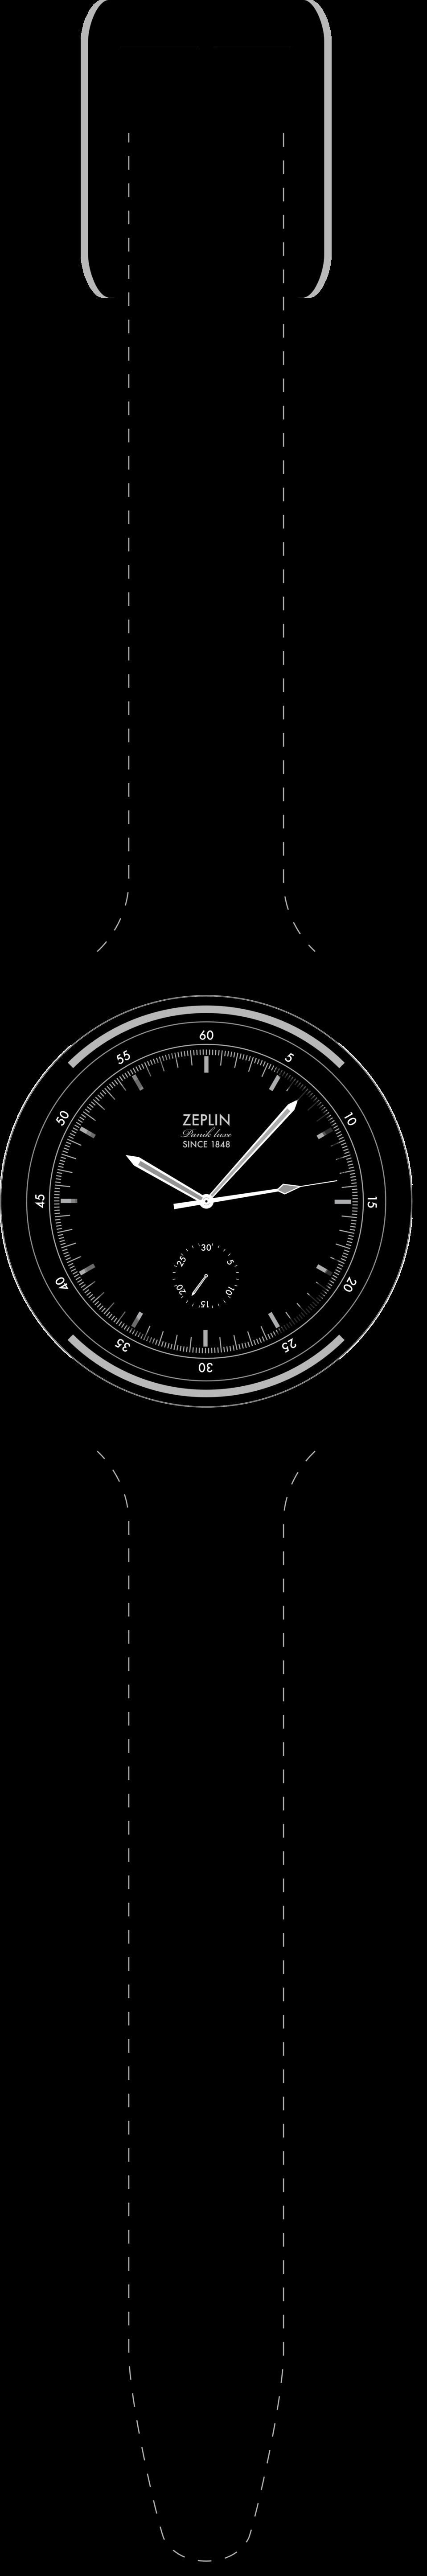 Illustration of a black watch